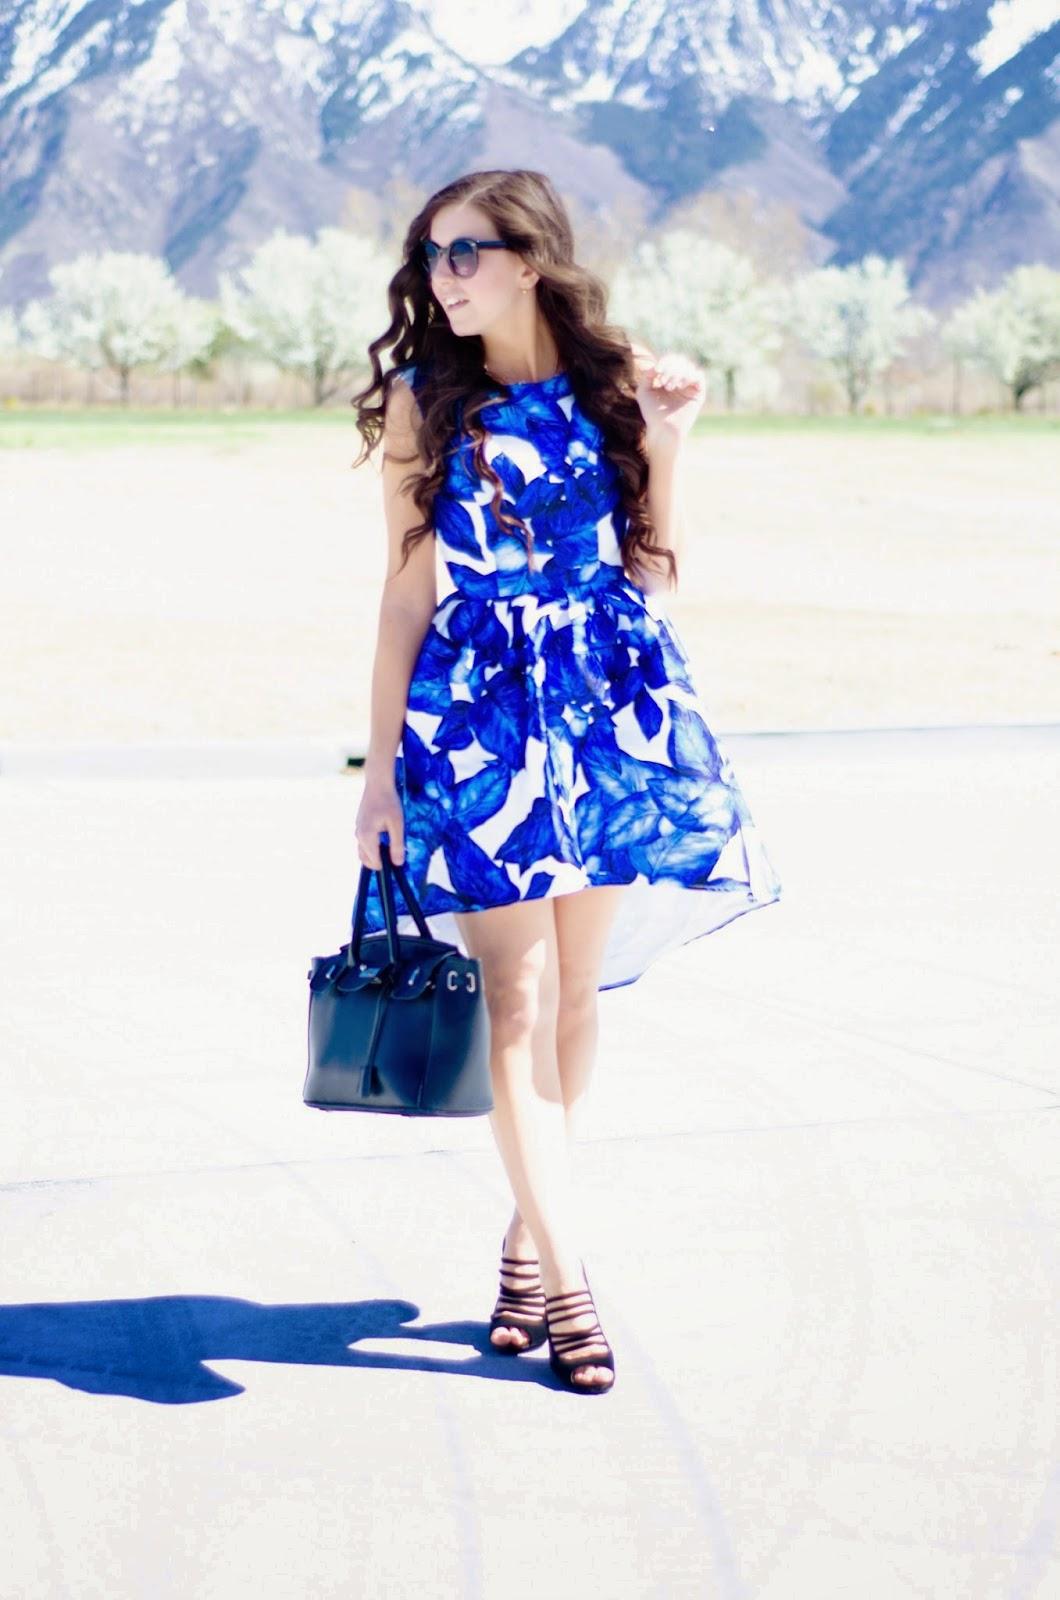 blue floral dress, blue floral high low dress, chi chi london dresses, chi chi clothing, chi chi london, blue dress, high low dress, summer dress, perfect summer dress,